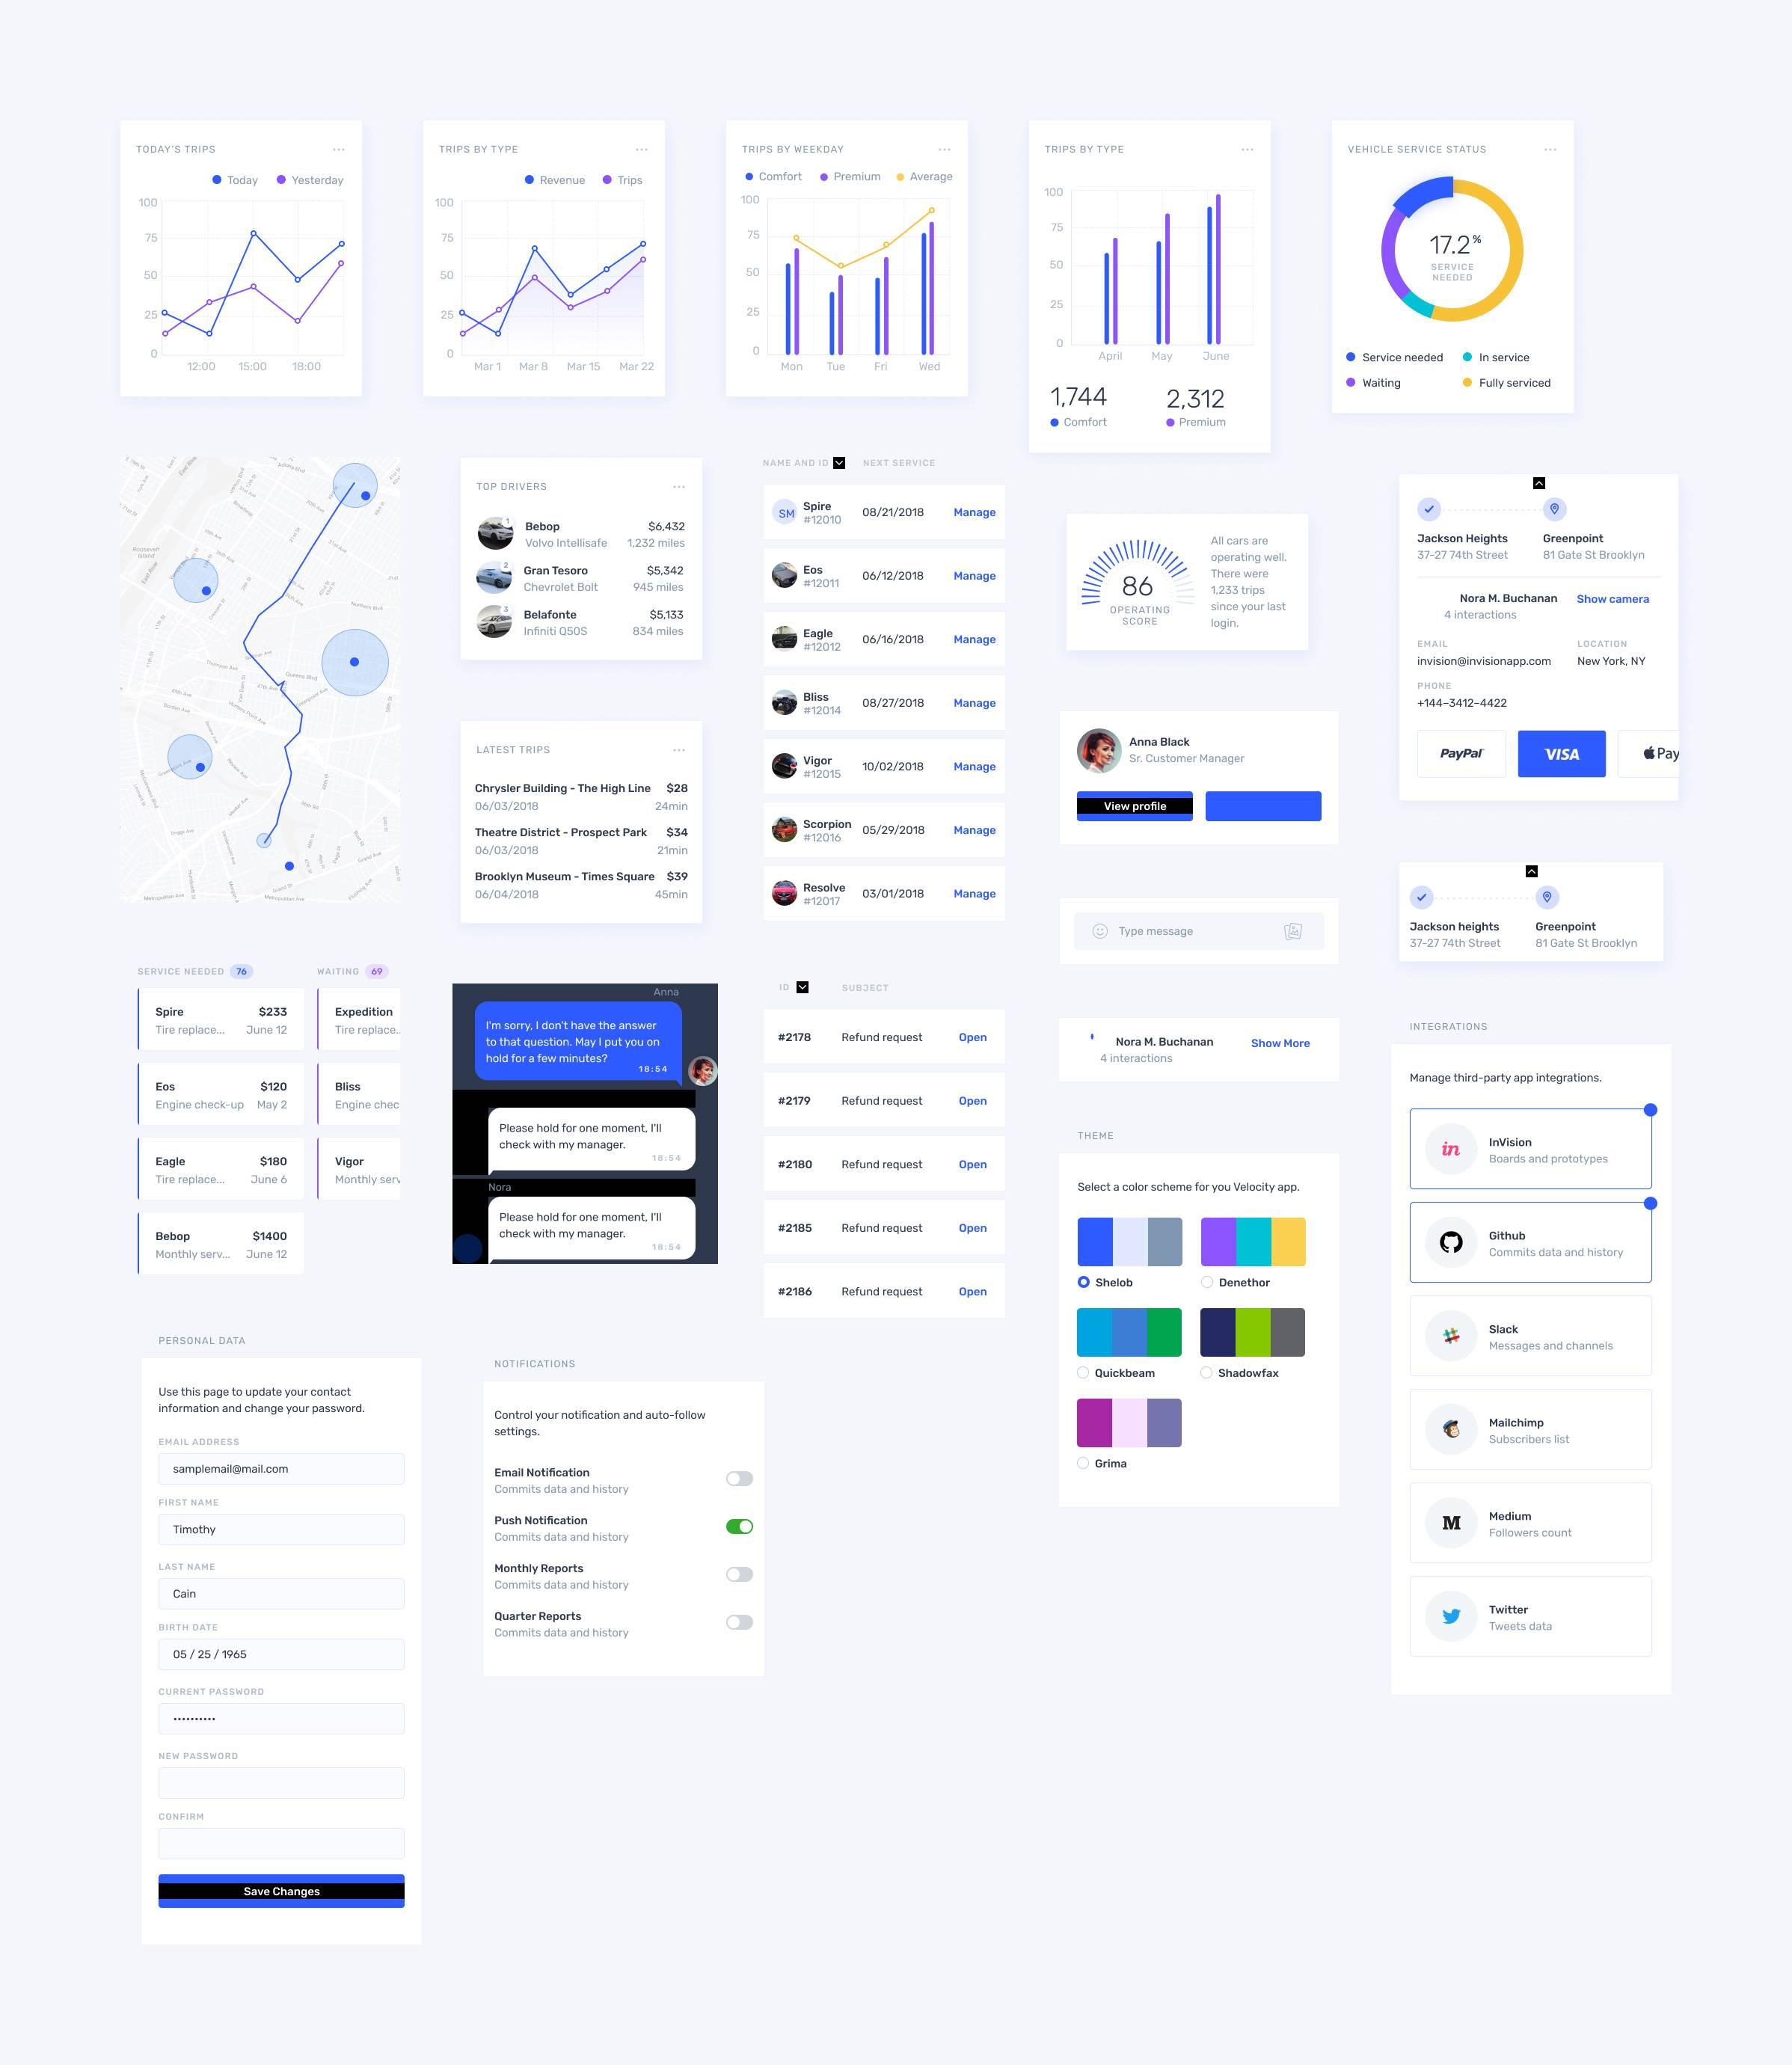 Velocity dashboard设计工具集uikit主题包 .sketch&.psd素材下载 主题包-第2张